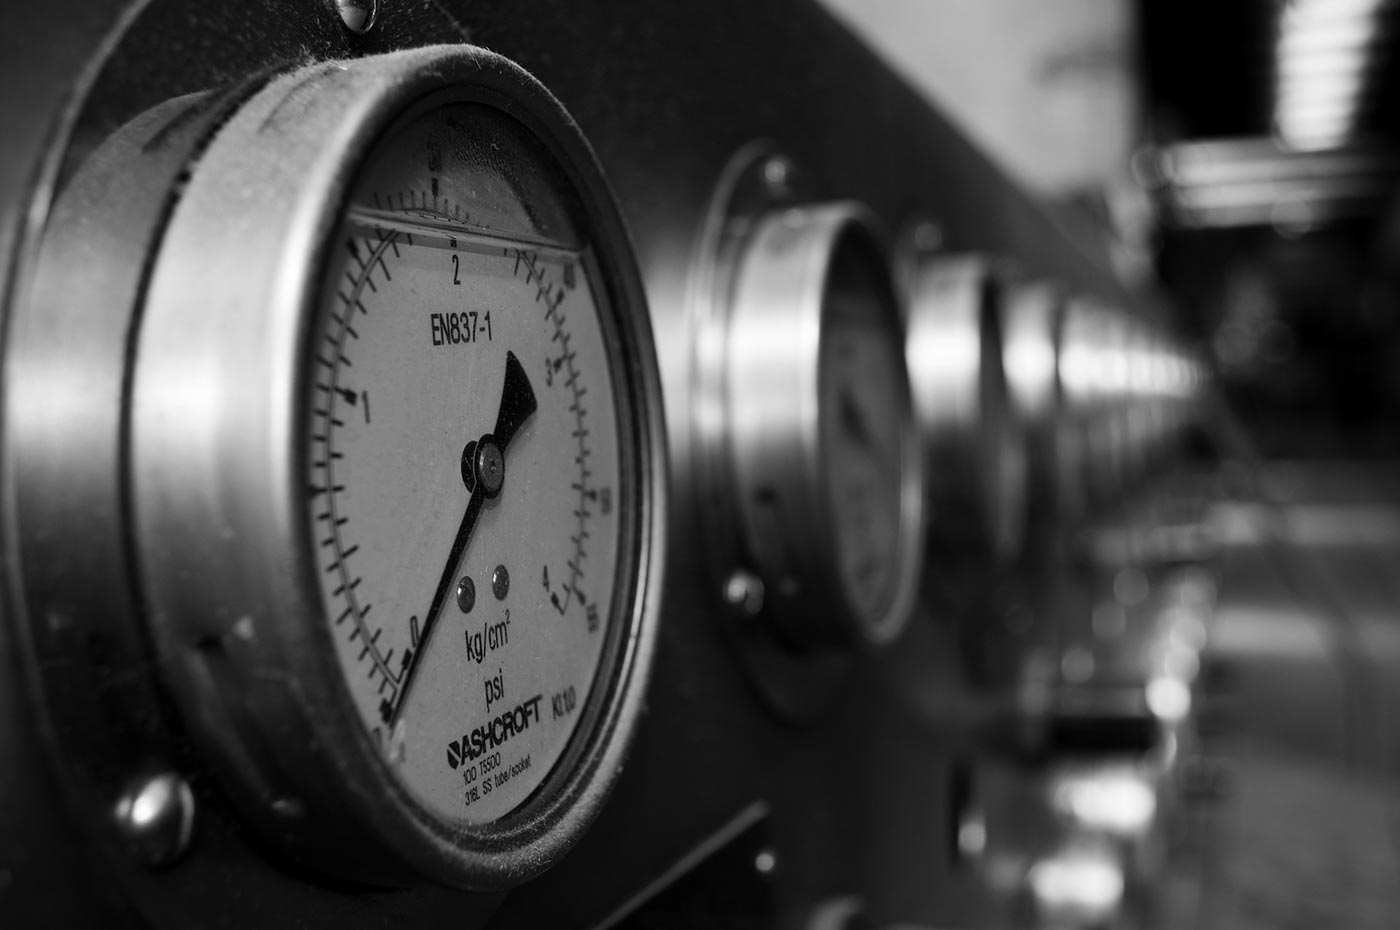 Industrial gauges